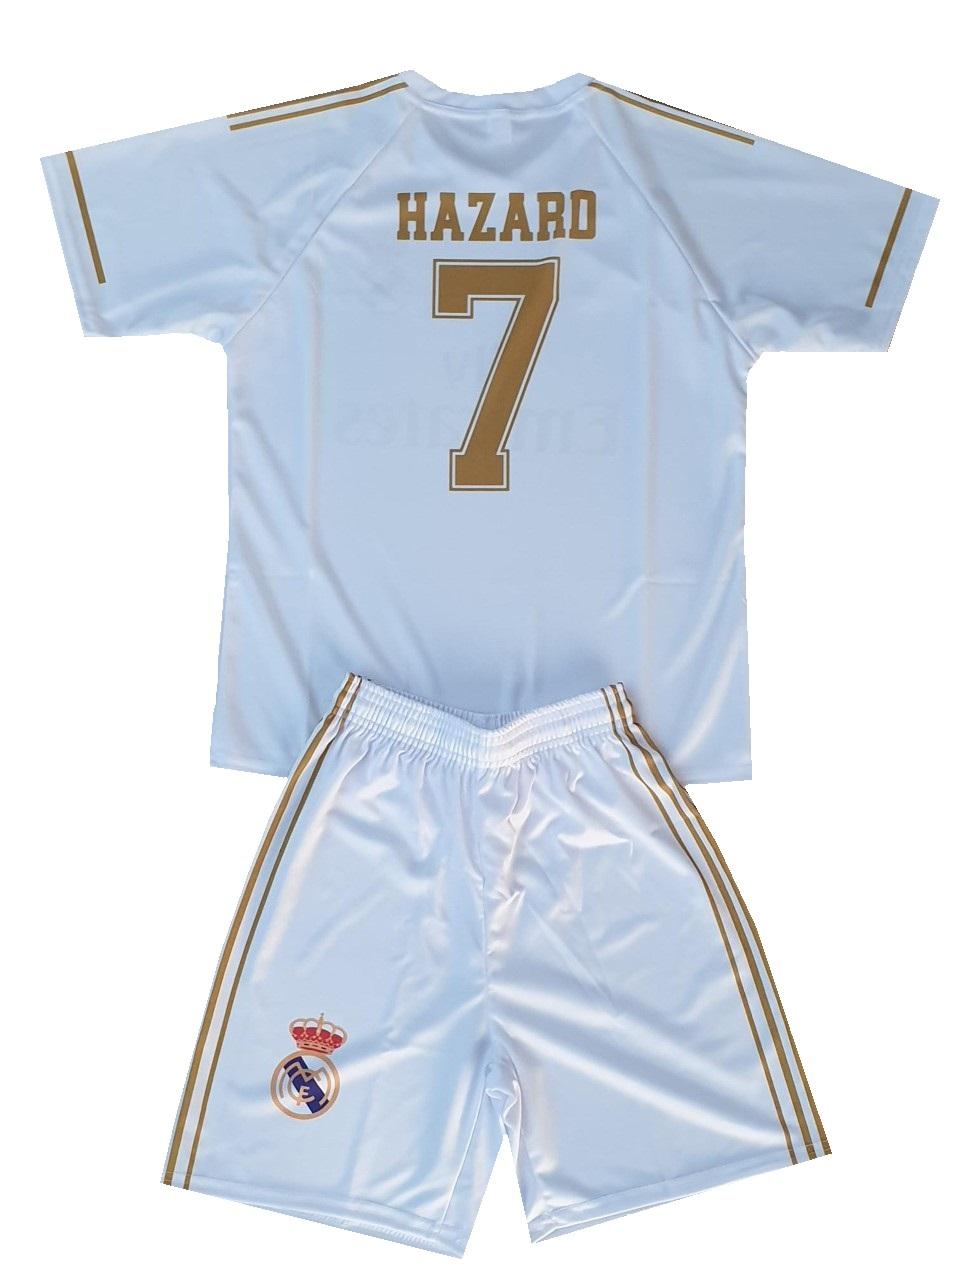 OXID eShop 4 | Real Madrid Fanshirt & Shorts HAZARD Kinder